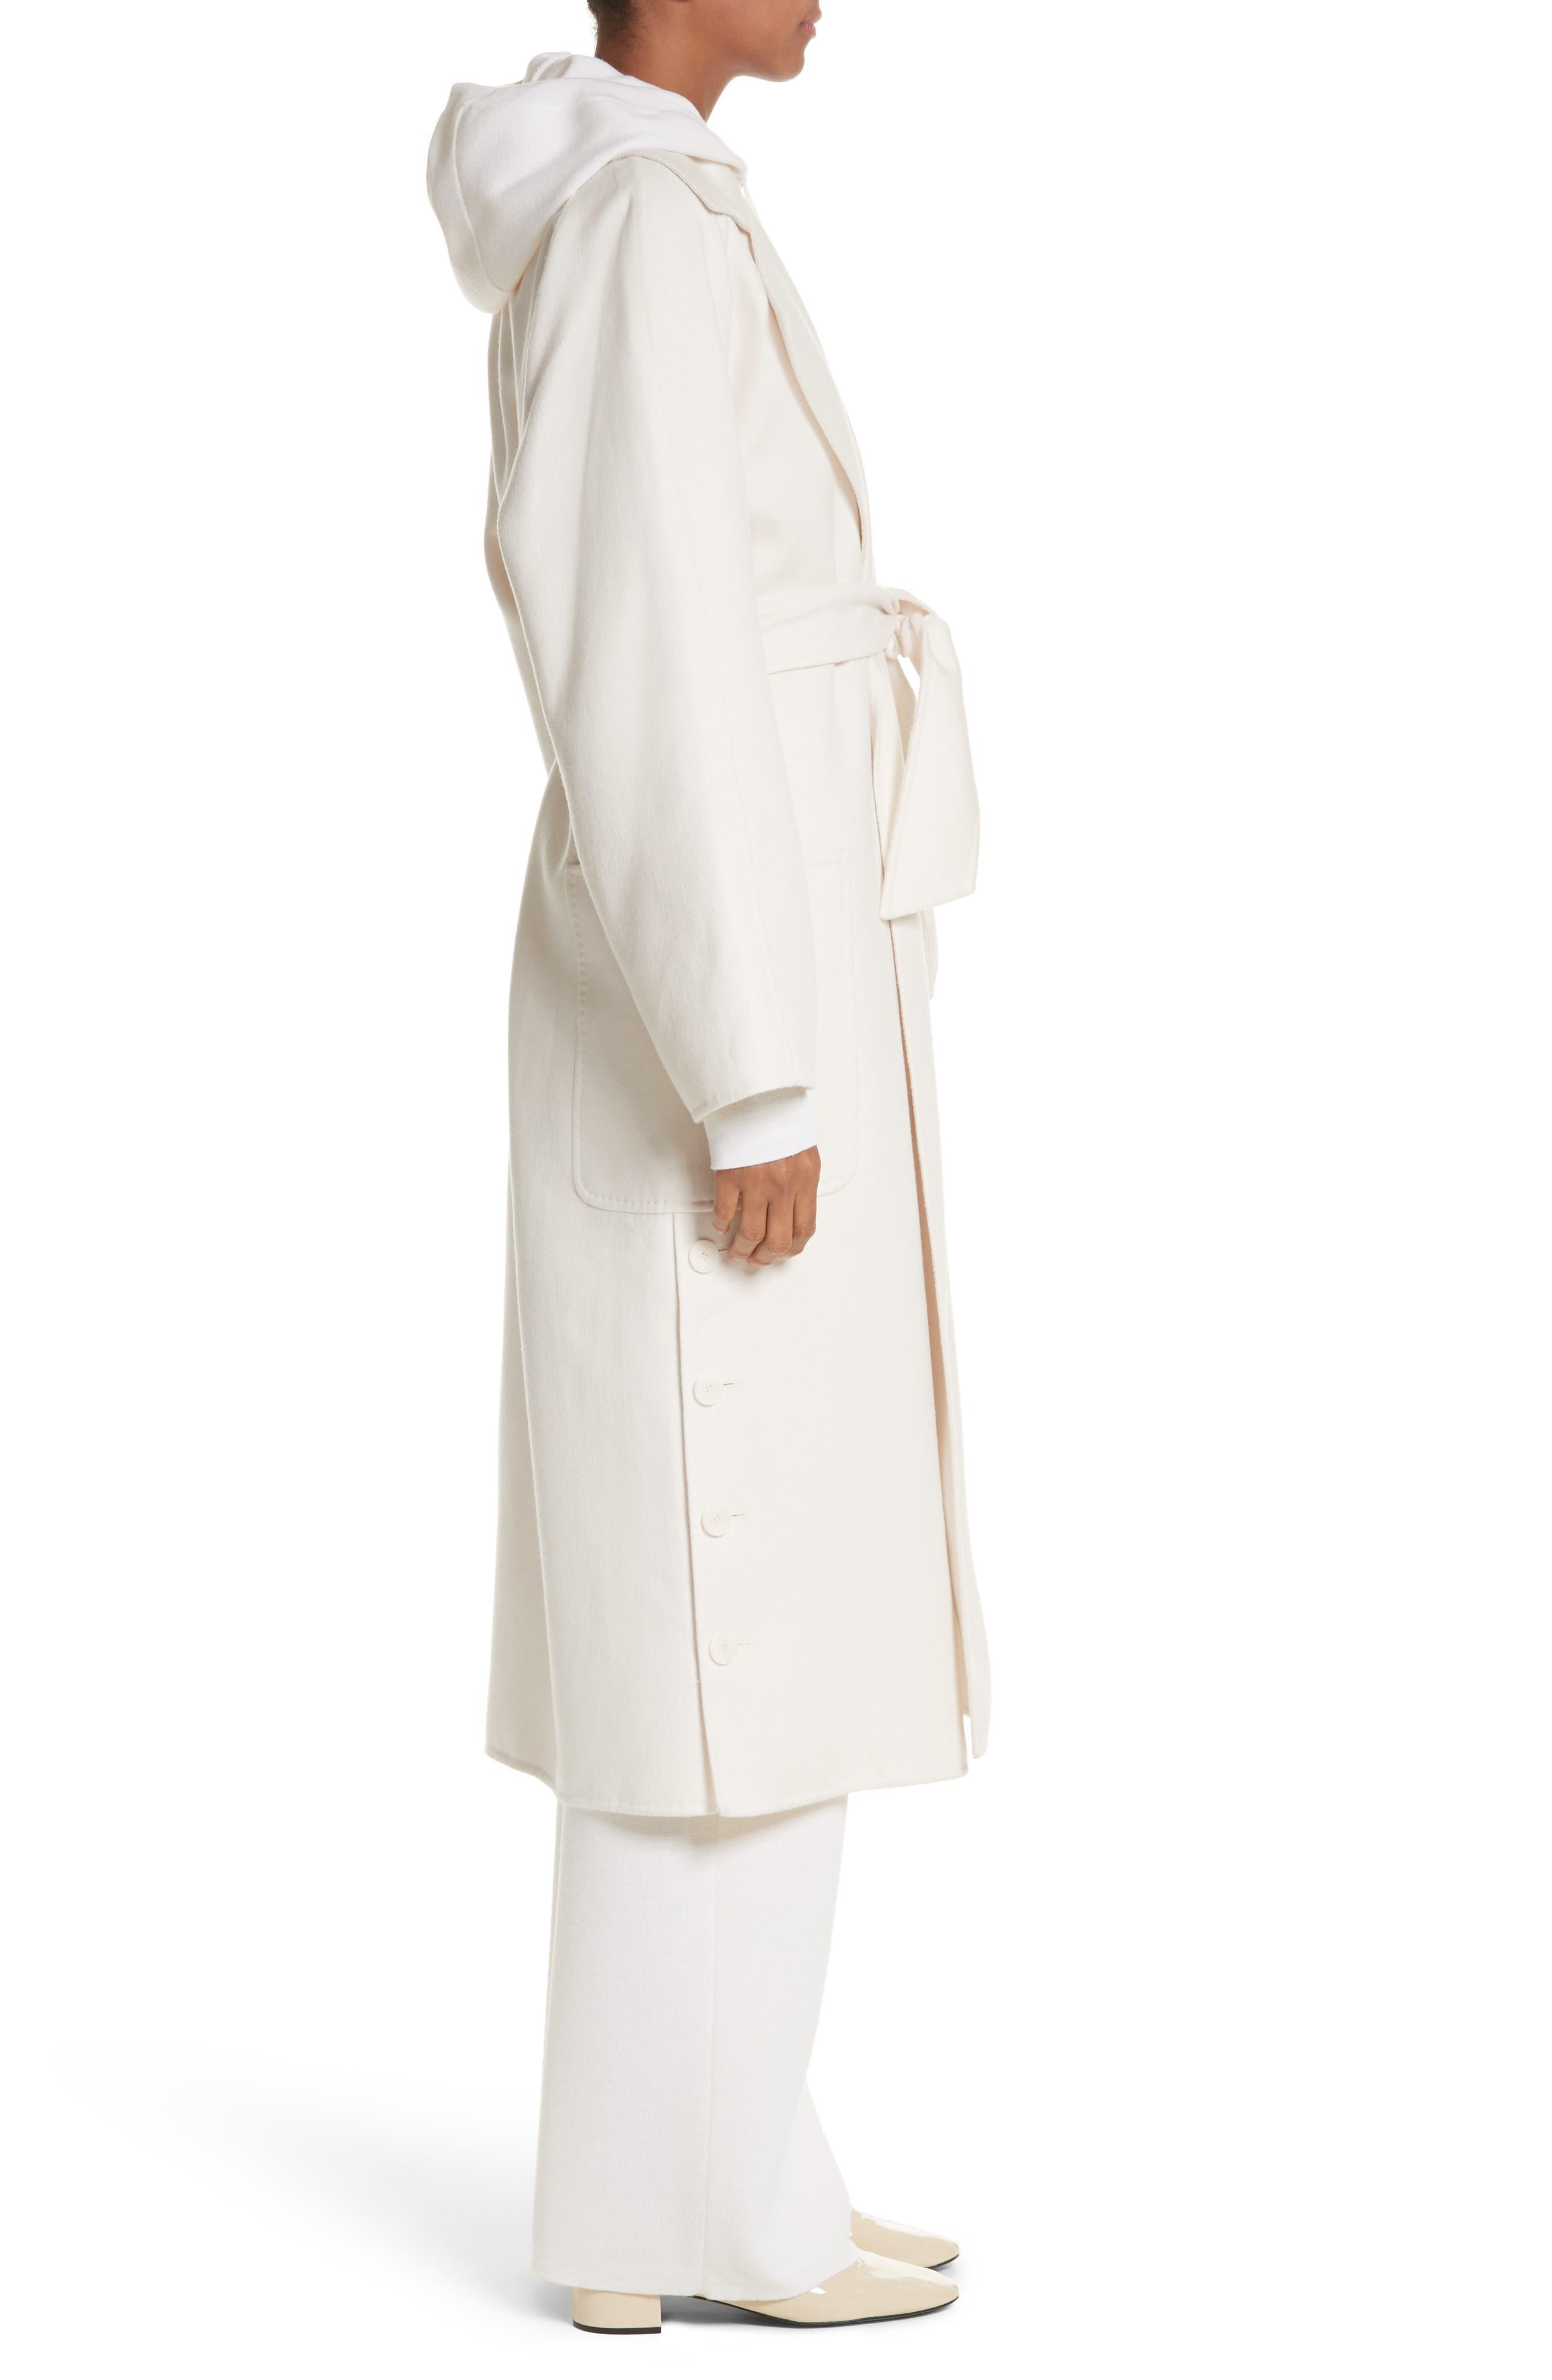 Alacre Wool & Cashmere Coat,                             Alternate thumbnail 3, color,                             110